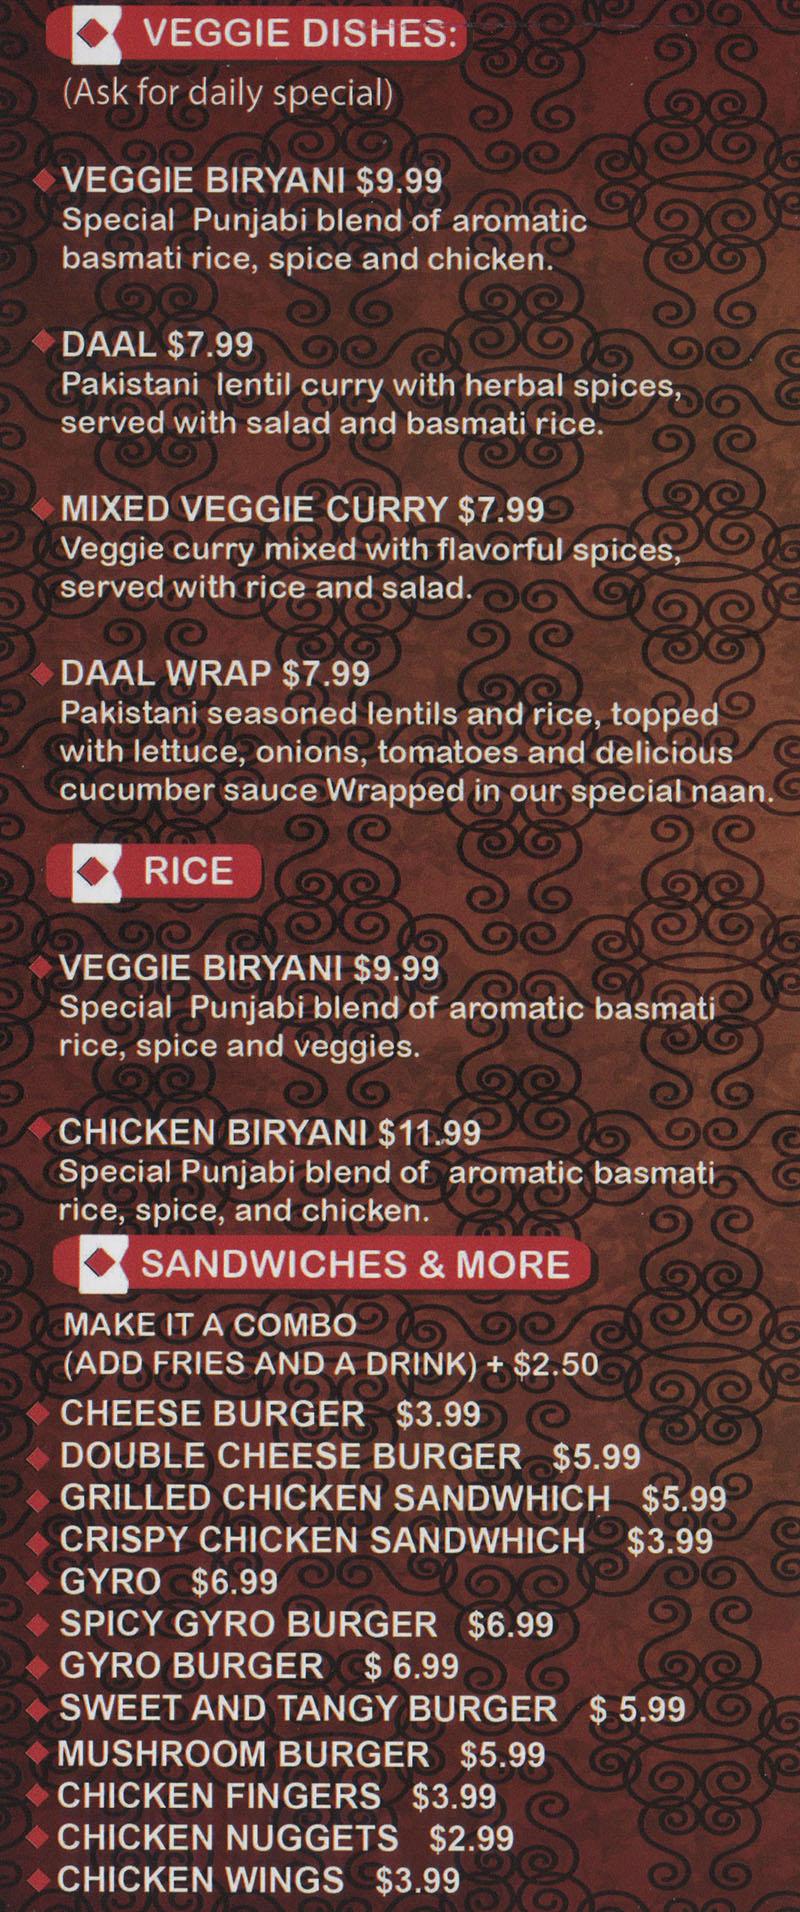 Kabob Stop menu - veggie dishes, rice, sandwiches